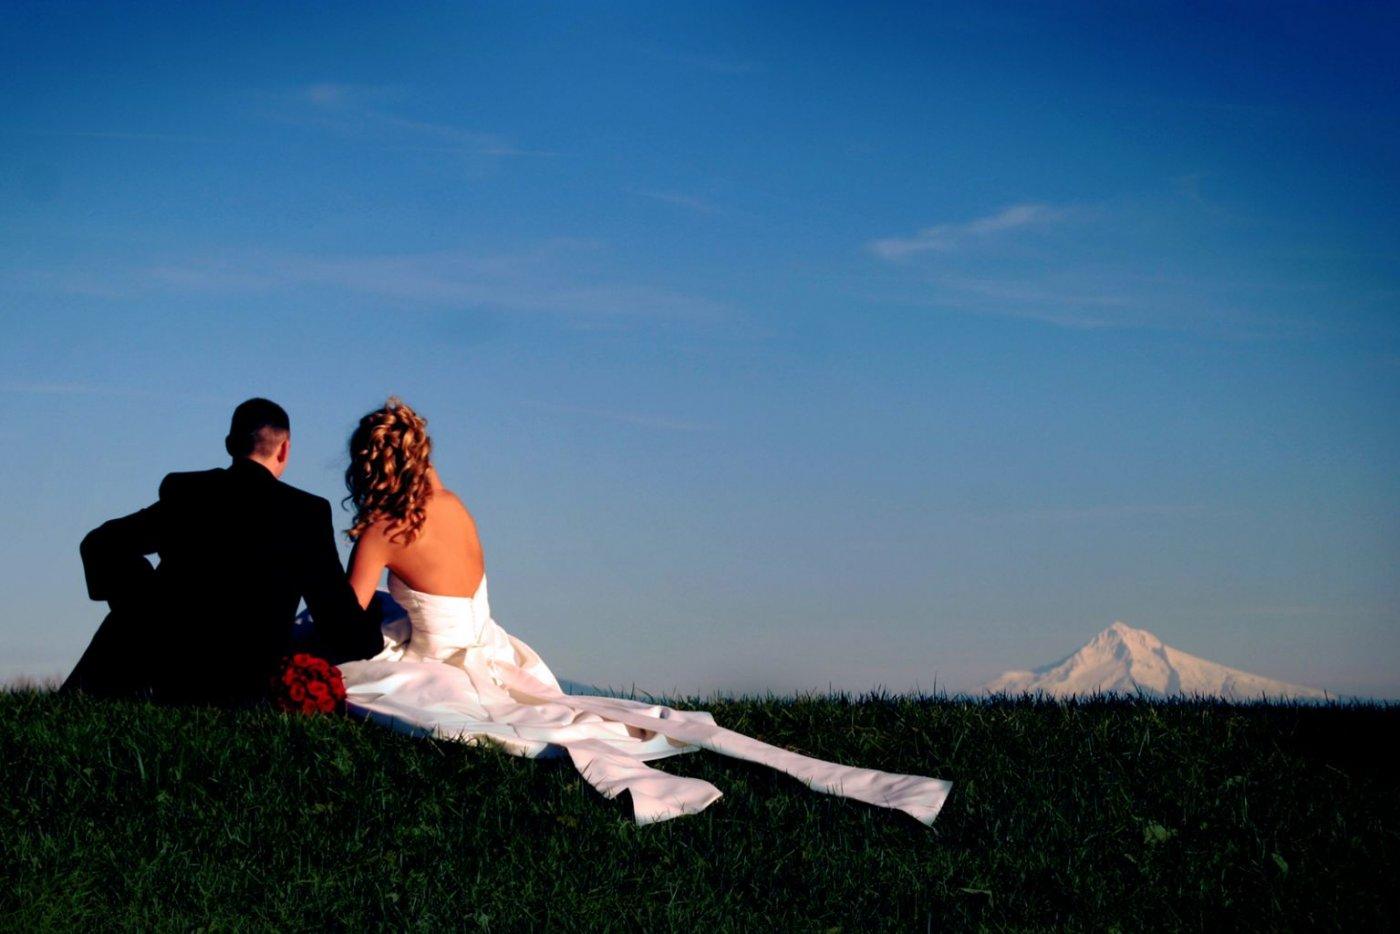 wedding-portfolio-5-1400x934.jpg